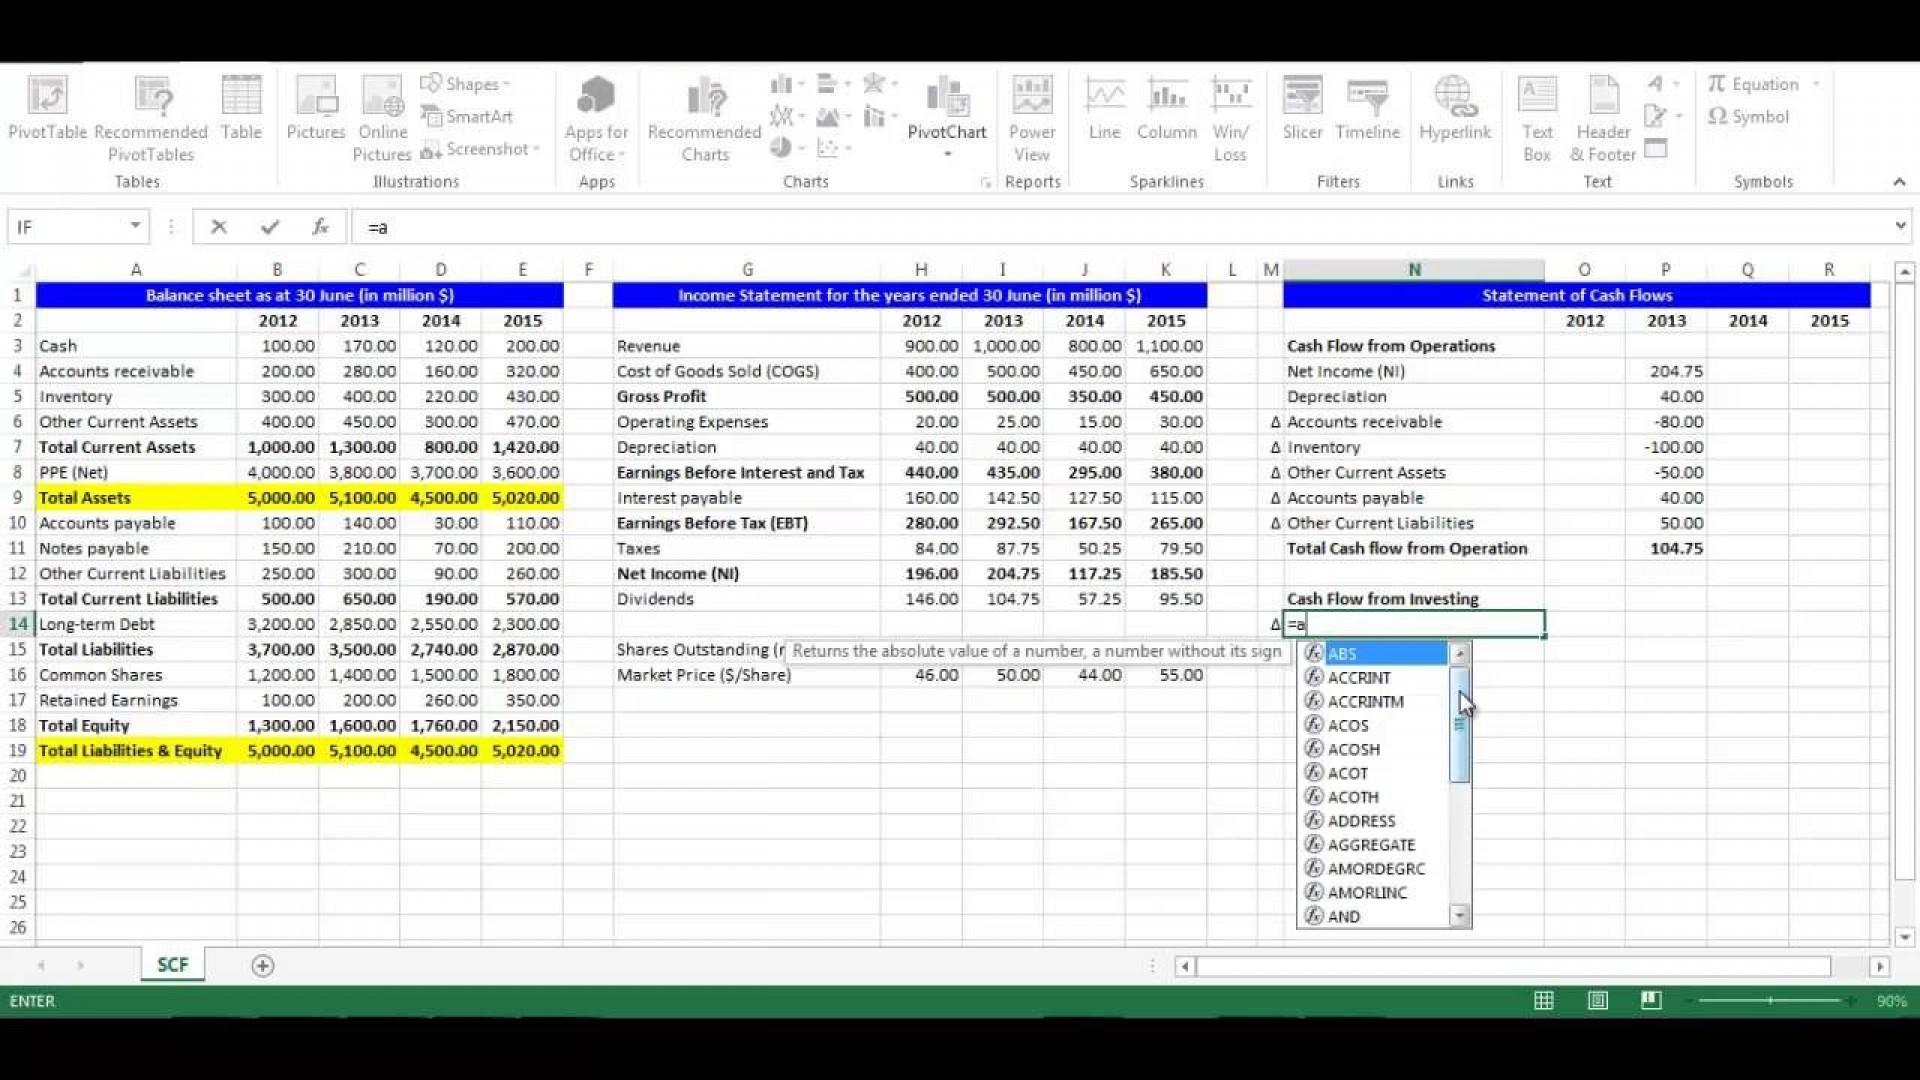 002 Outstanding Cash Flow Template Excel Concept  2007 Download1920